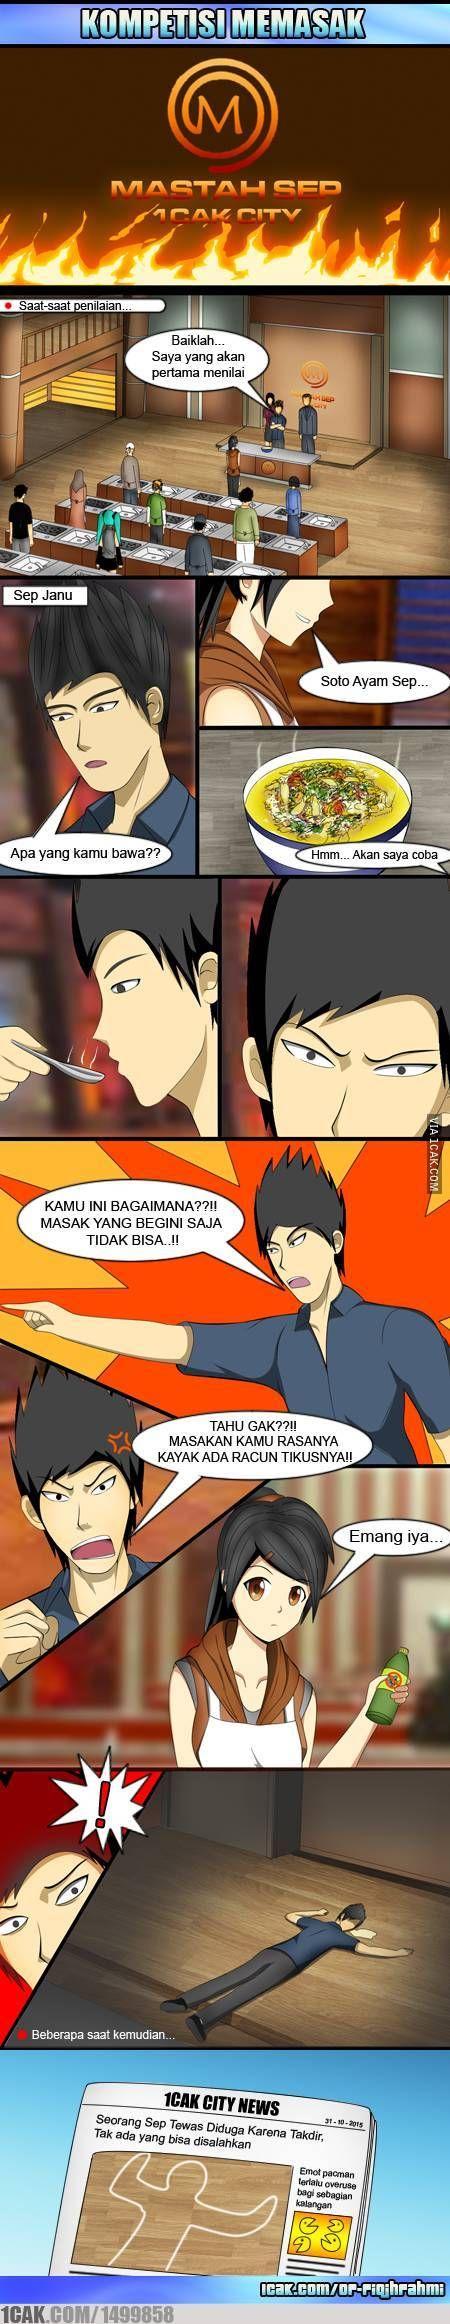 The 25 best meme indonesia ideas on pinterest indonesia humor